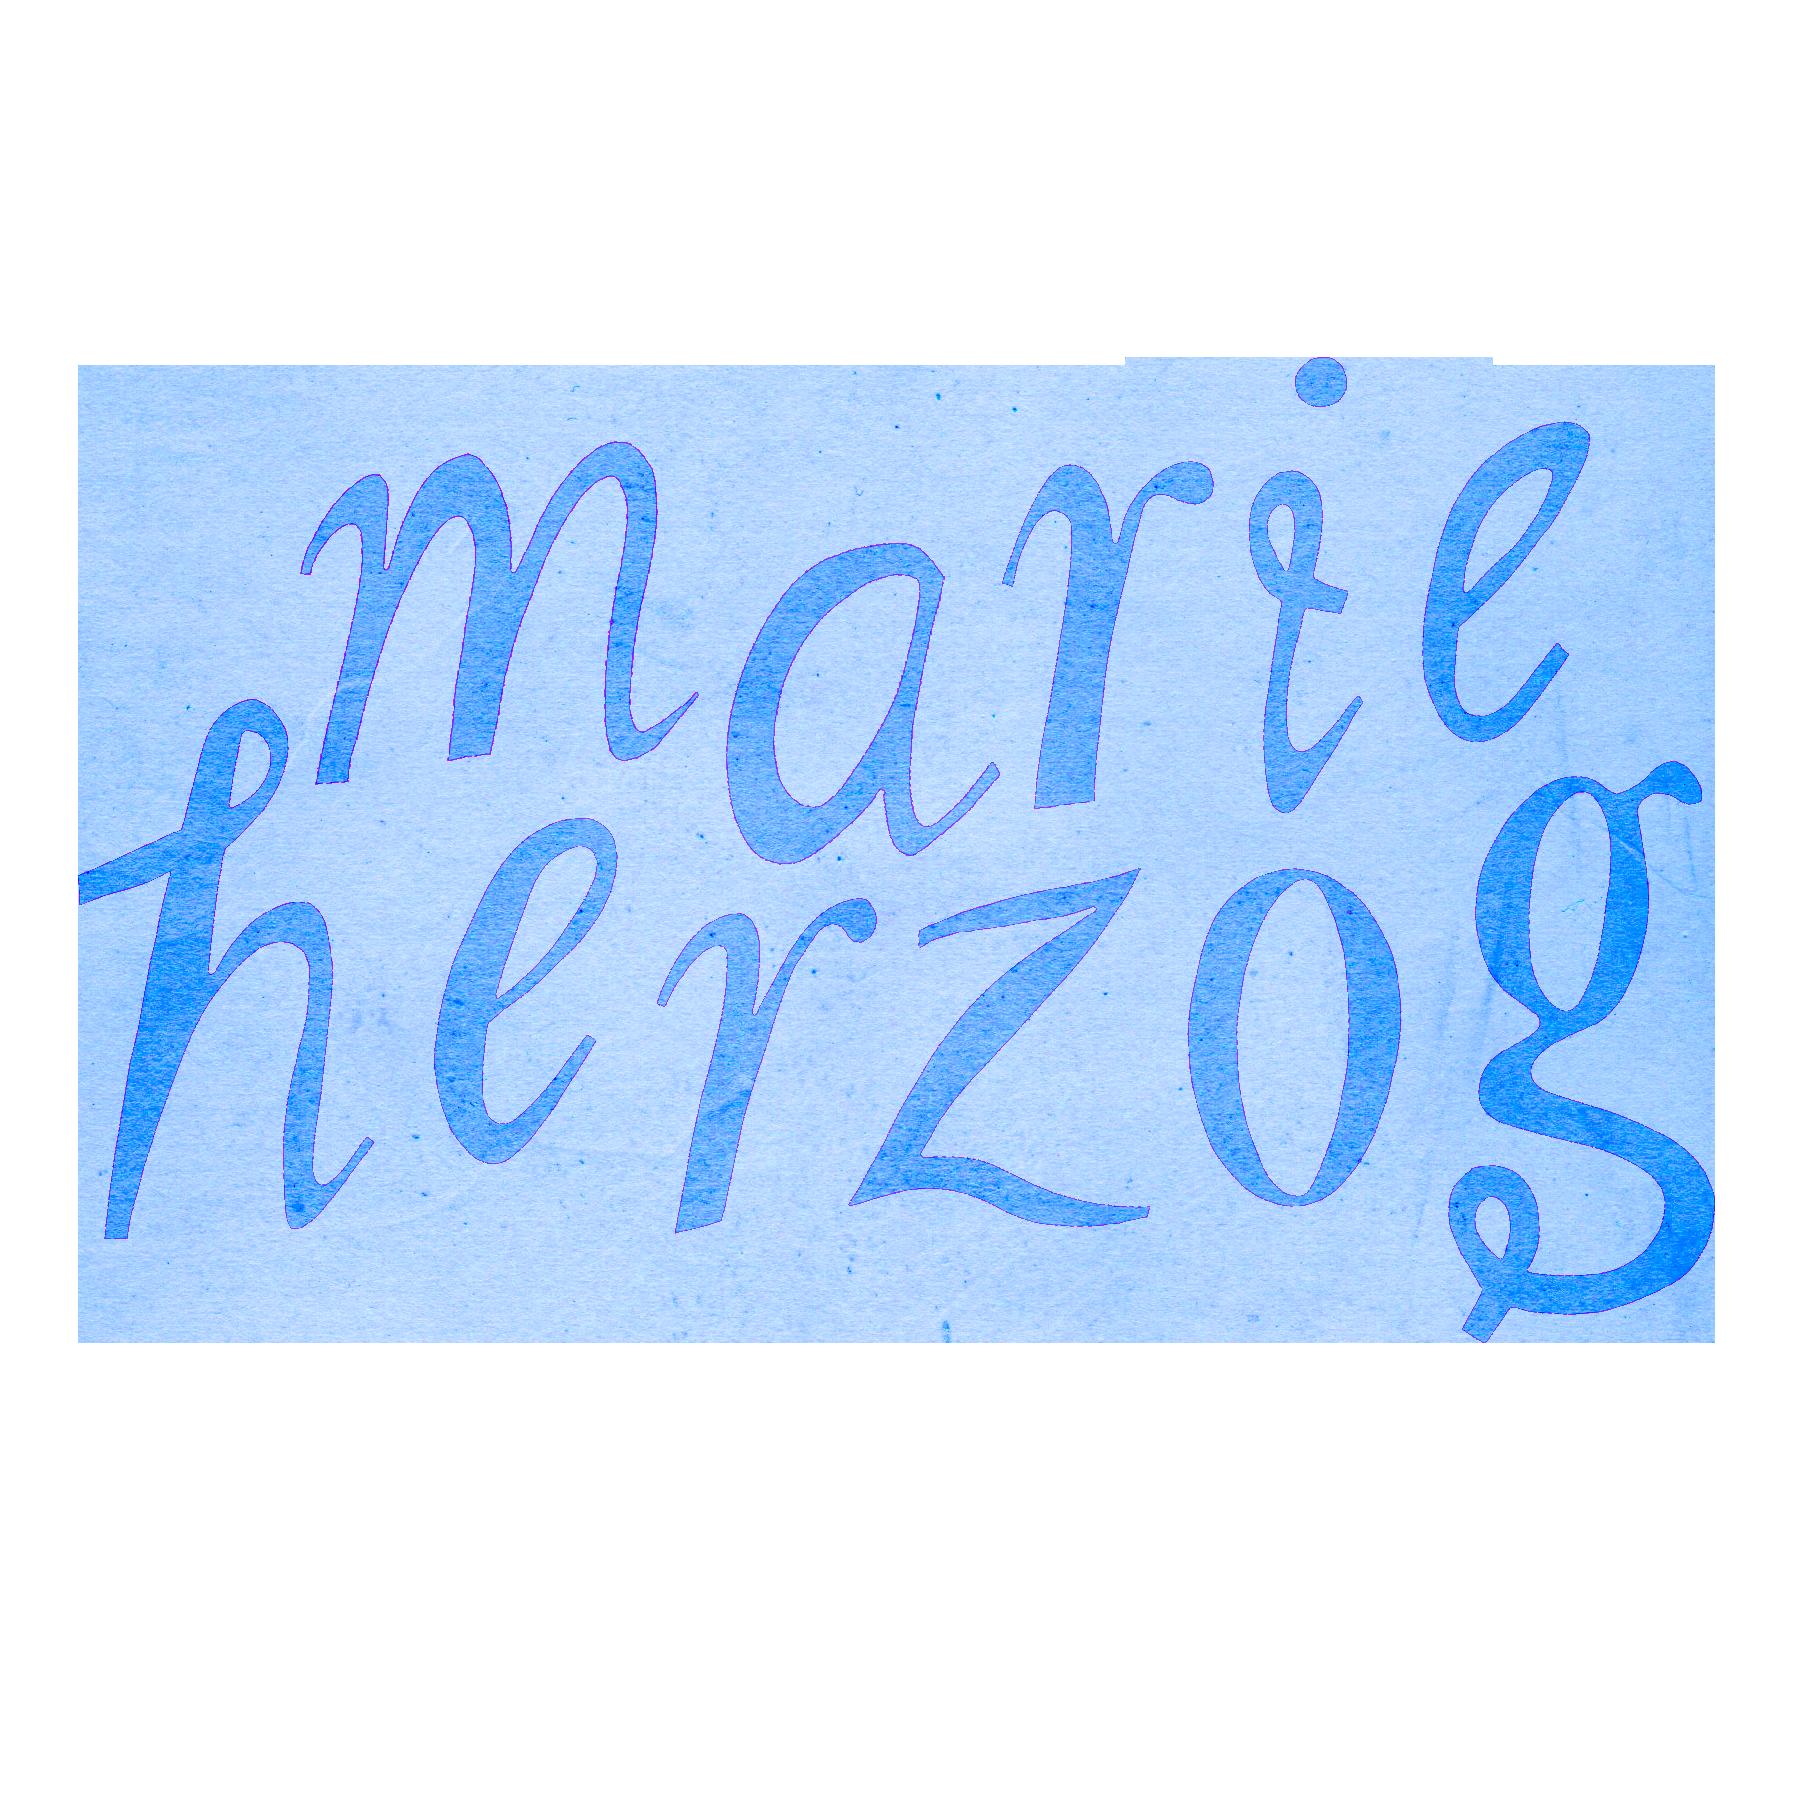 Marie Herzog